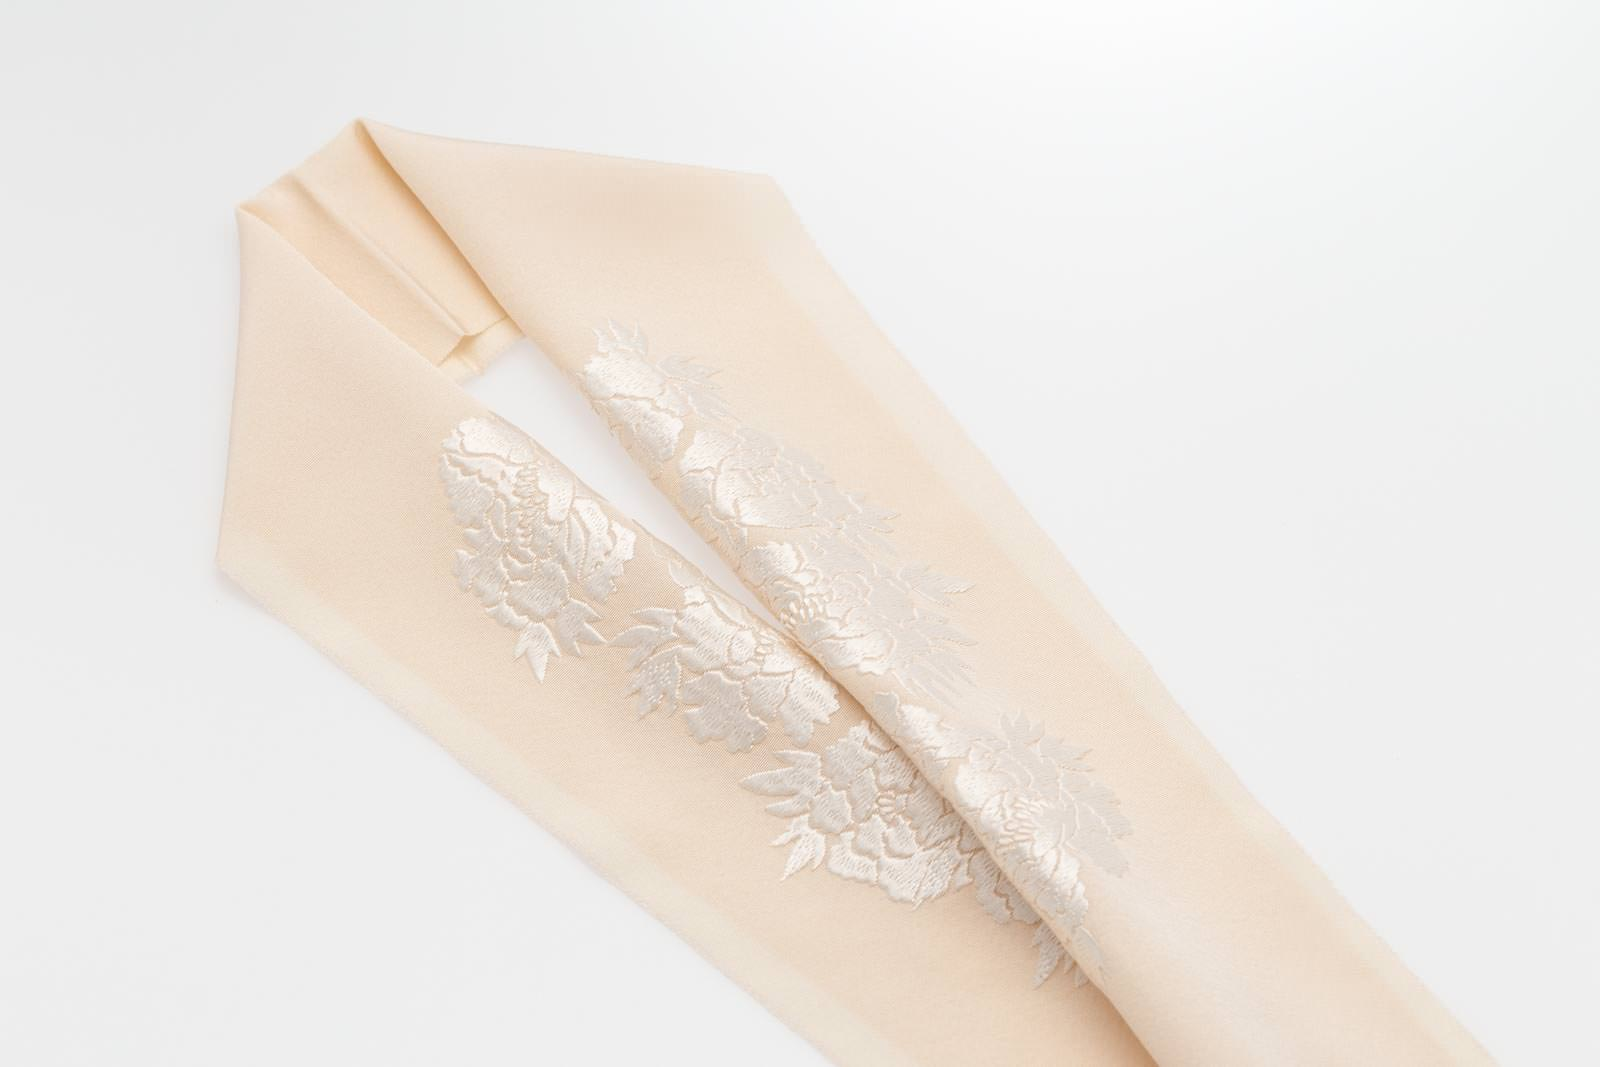 手刺繍 半襟 パールトーン加工済 シルク100% 塩瀬 手刺繍 半衿 薄香色 牡丹